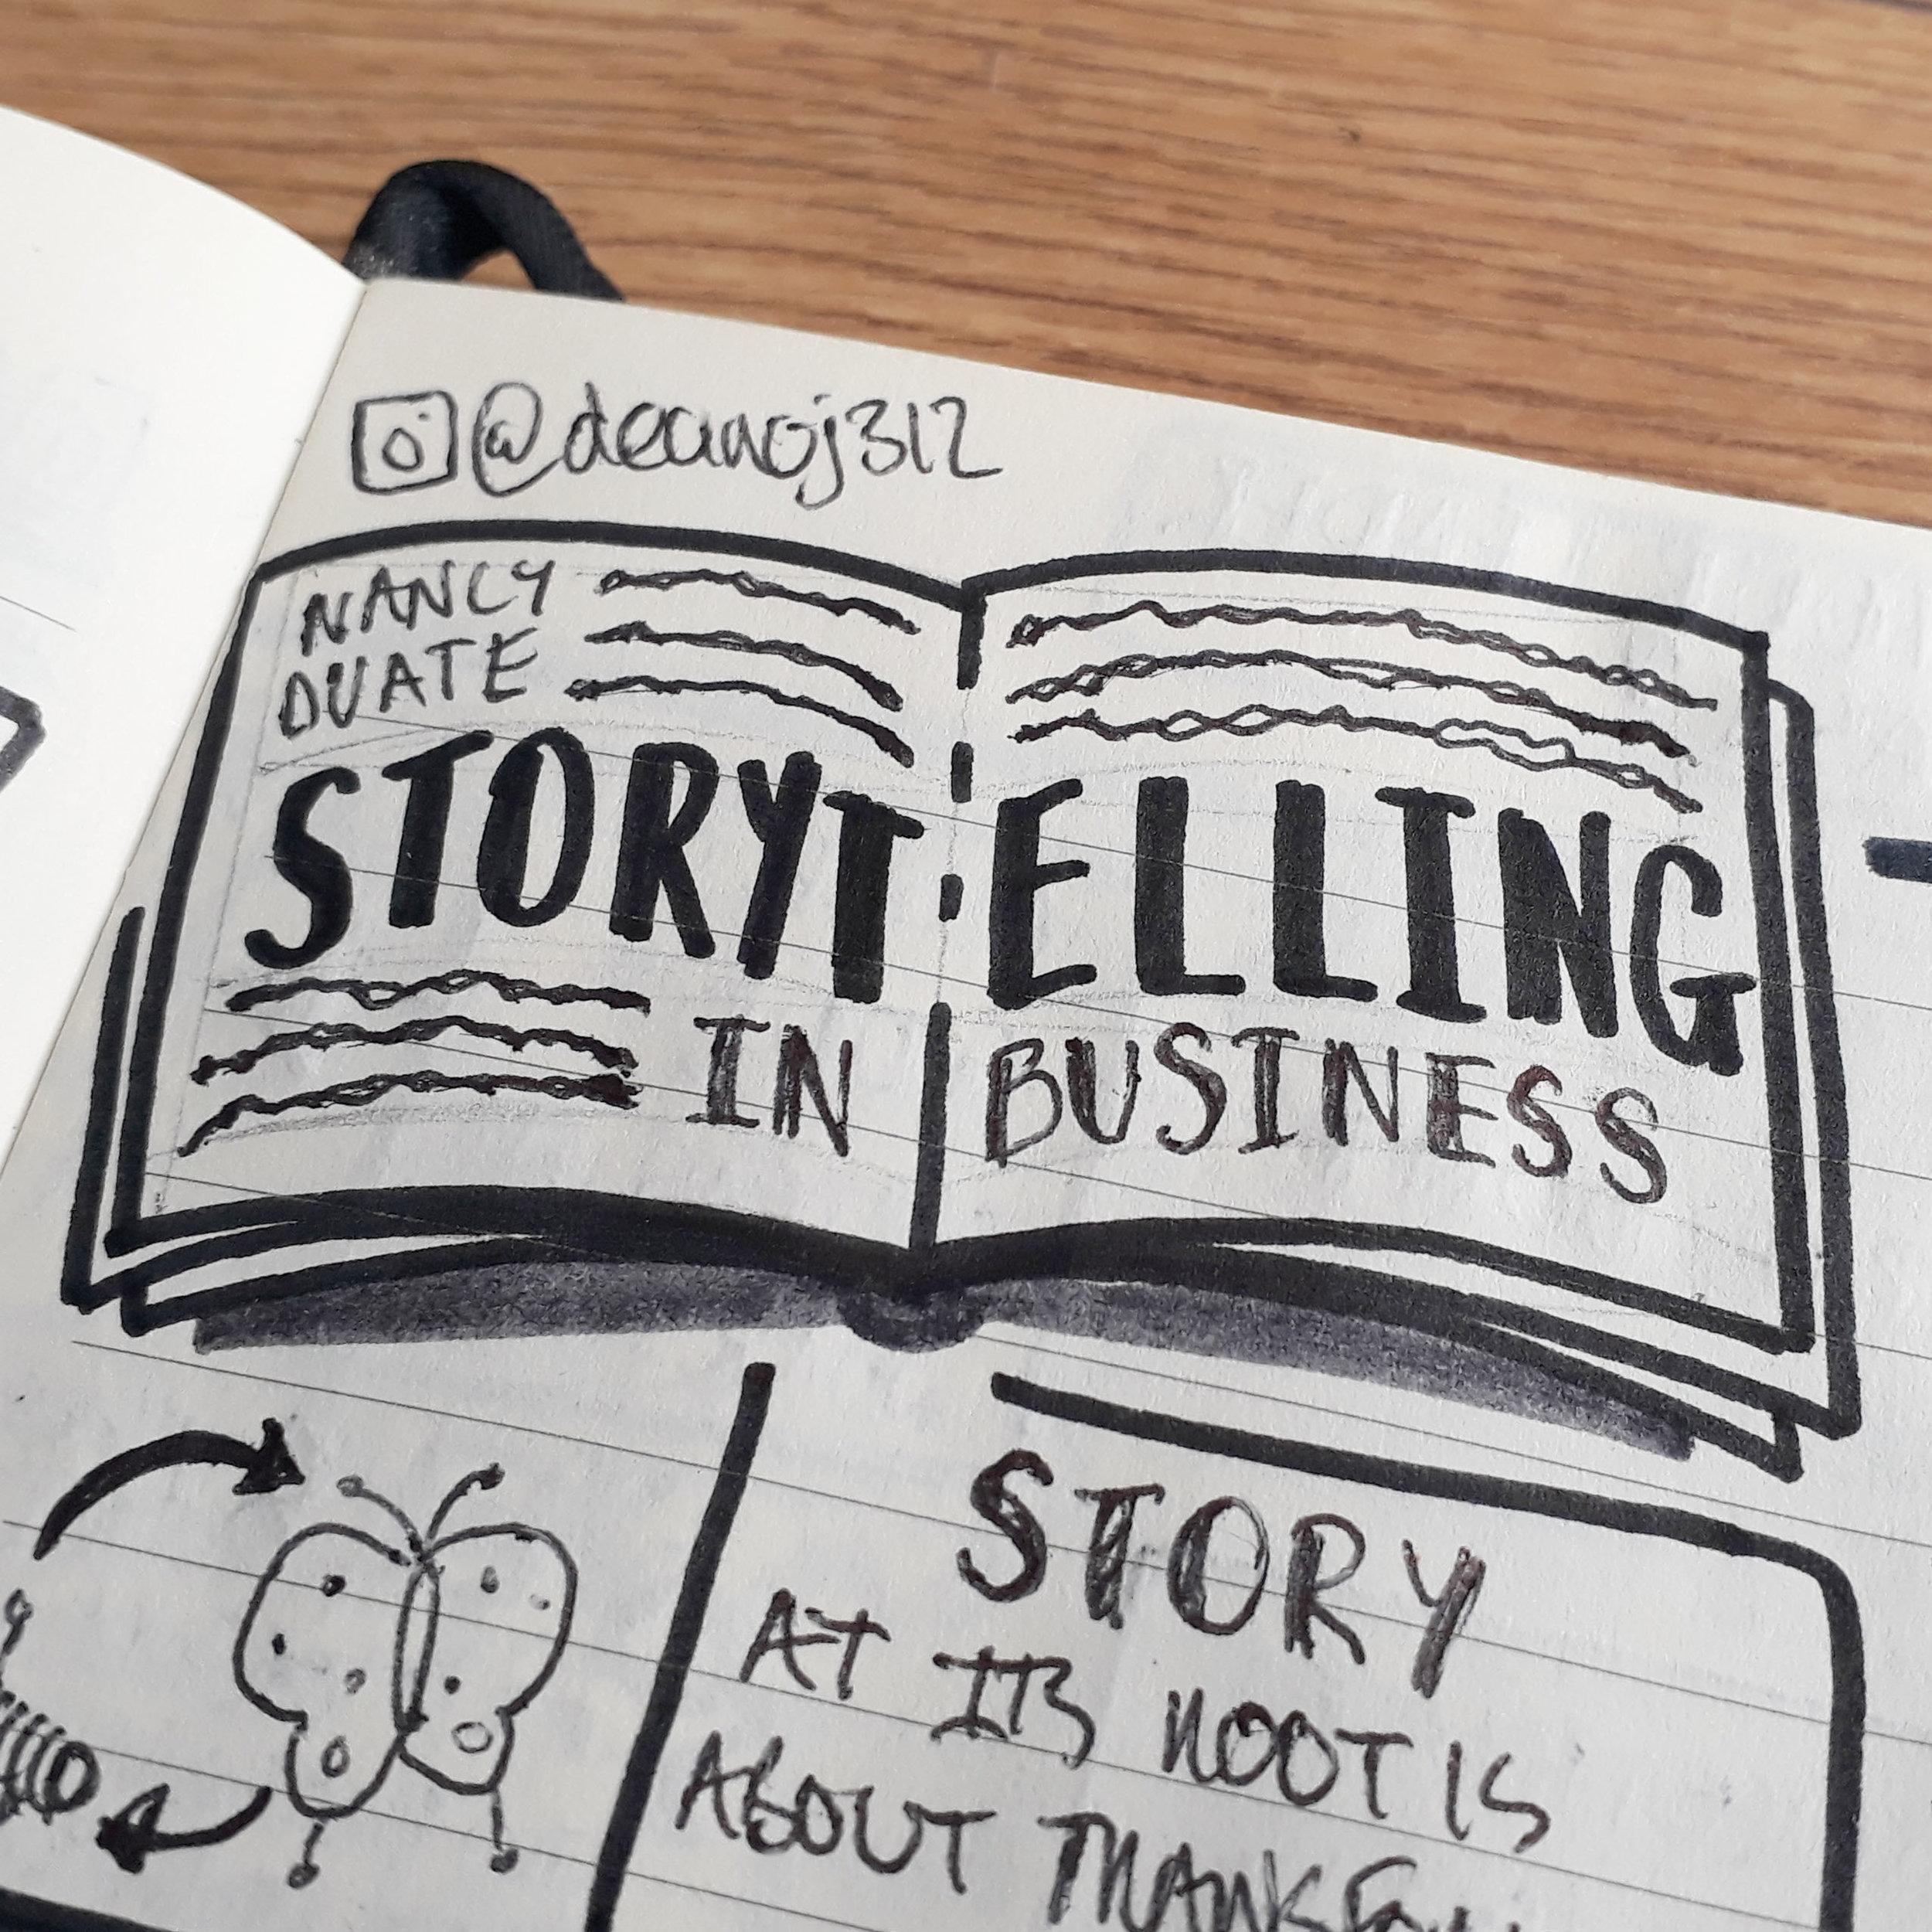 StorytellingInBusiness1.jpg